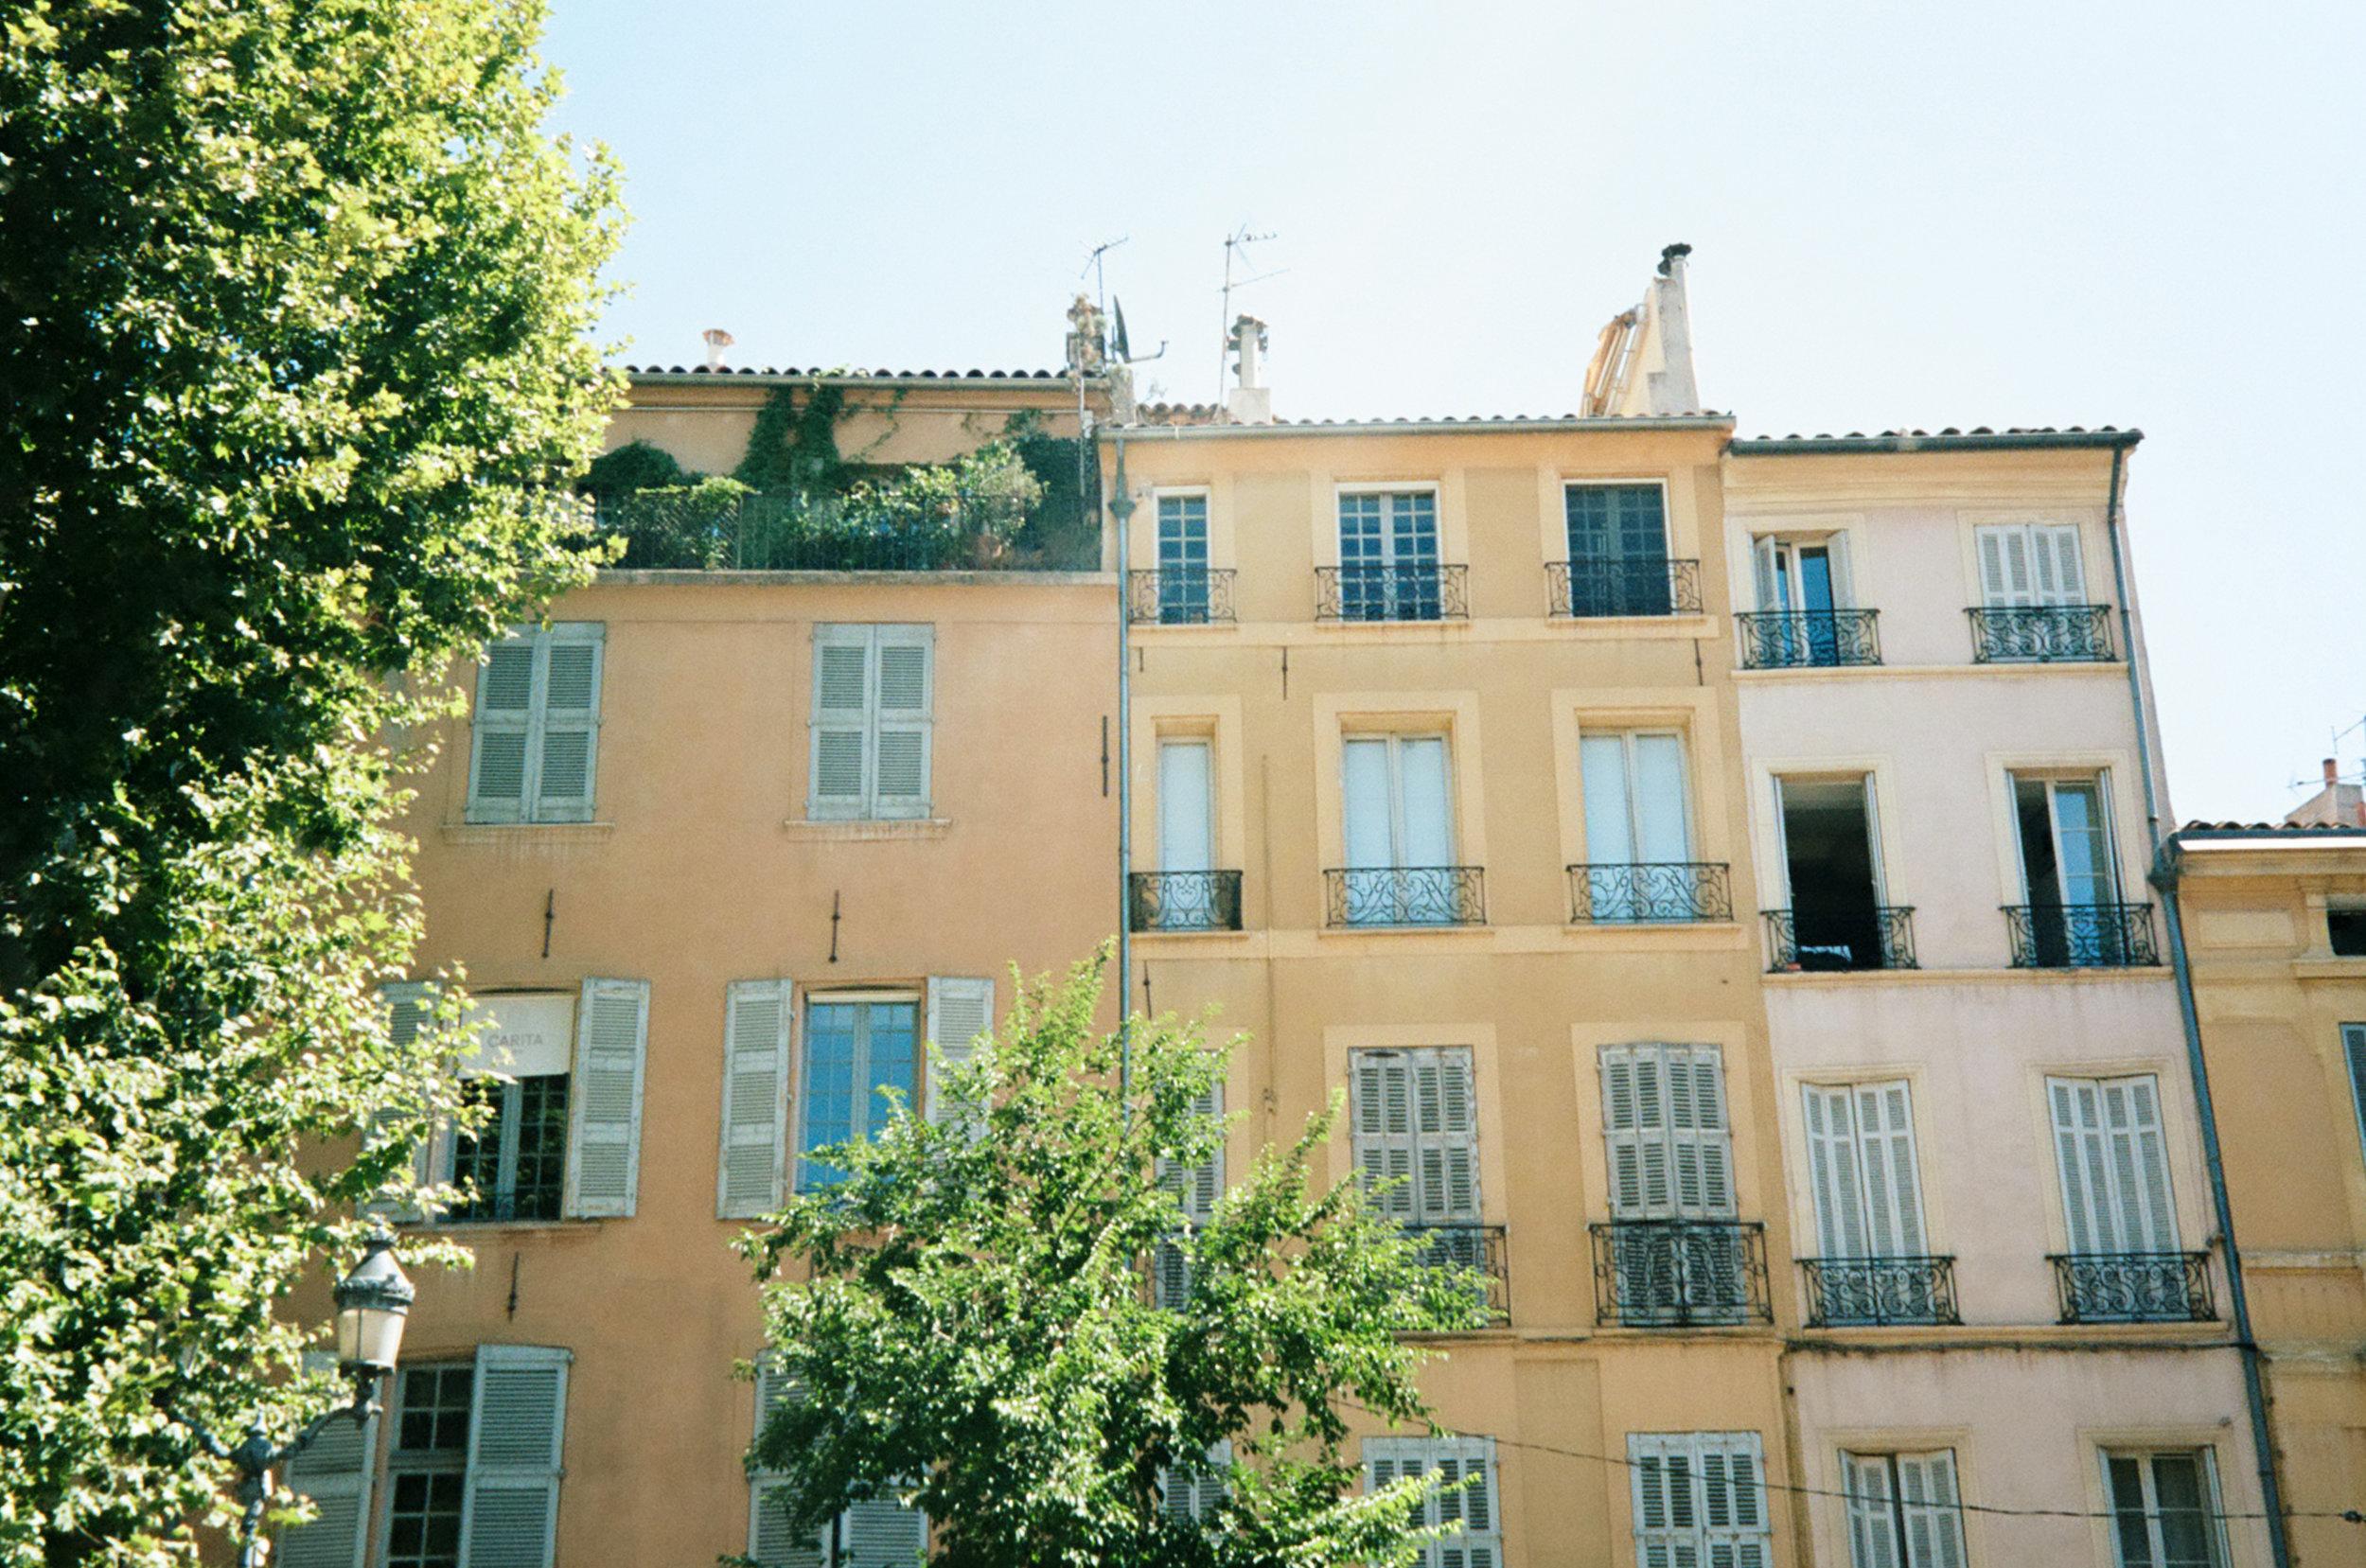 Carin_Olsson_Provence_05.jpg